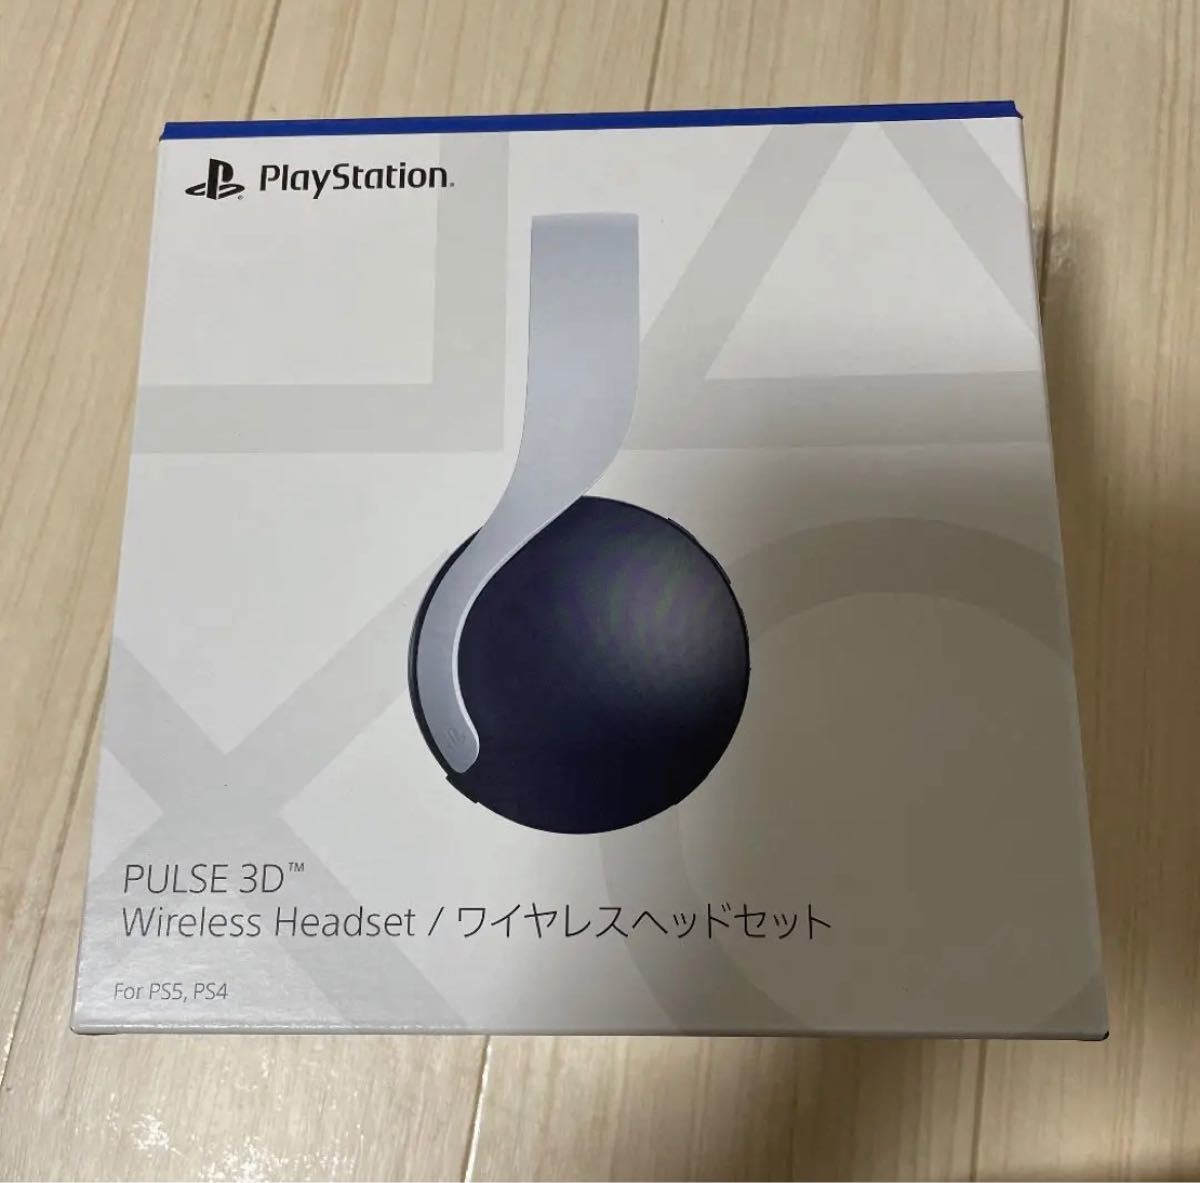 ps5 ワイヤレスヘッドセット PULSE 3D ps4プレイステーション5 ヘッドセット 2